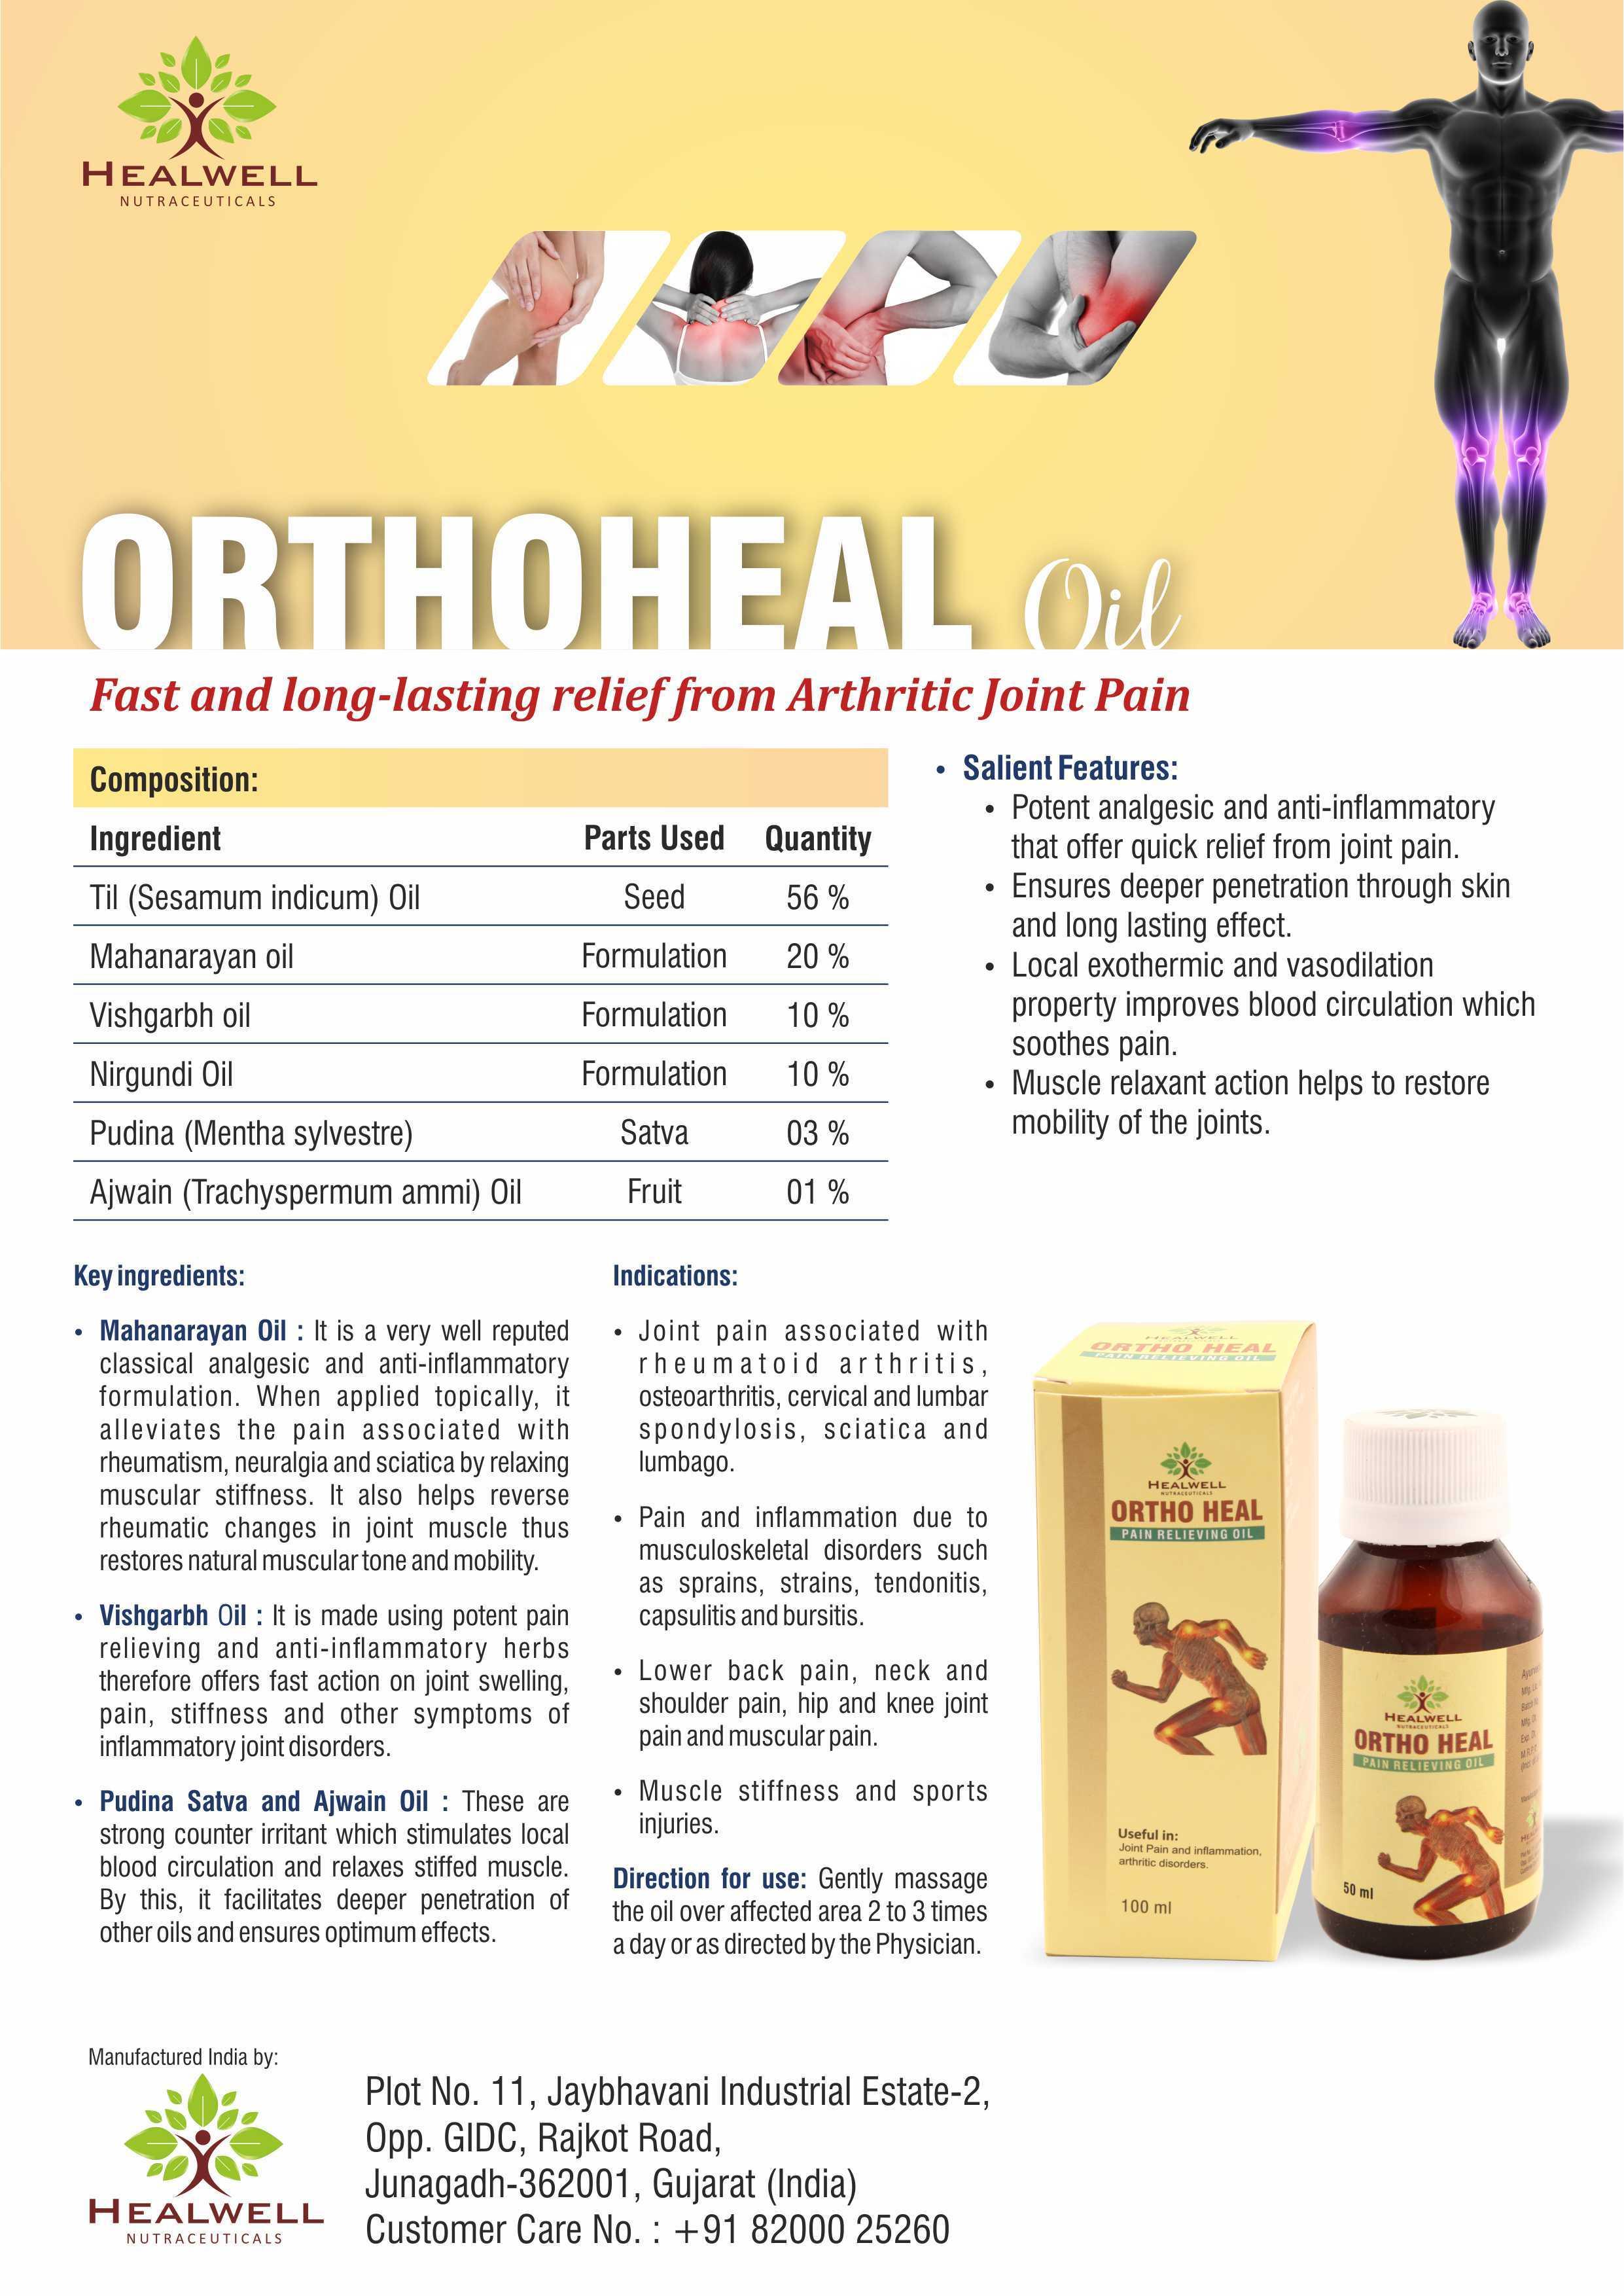 Herbal / Ayurvedic Pain Relief Oil